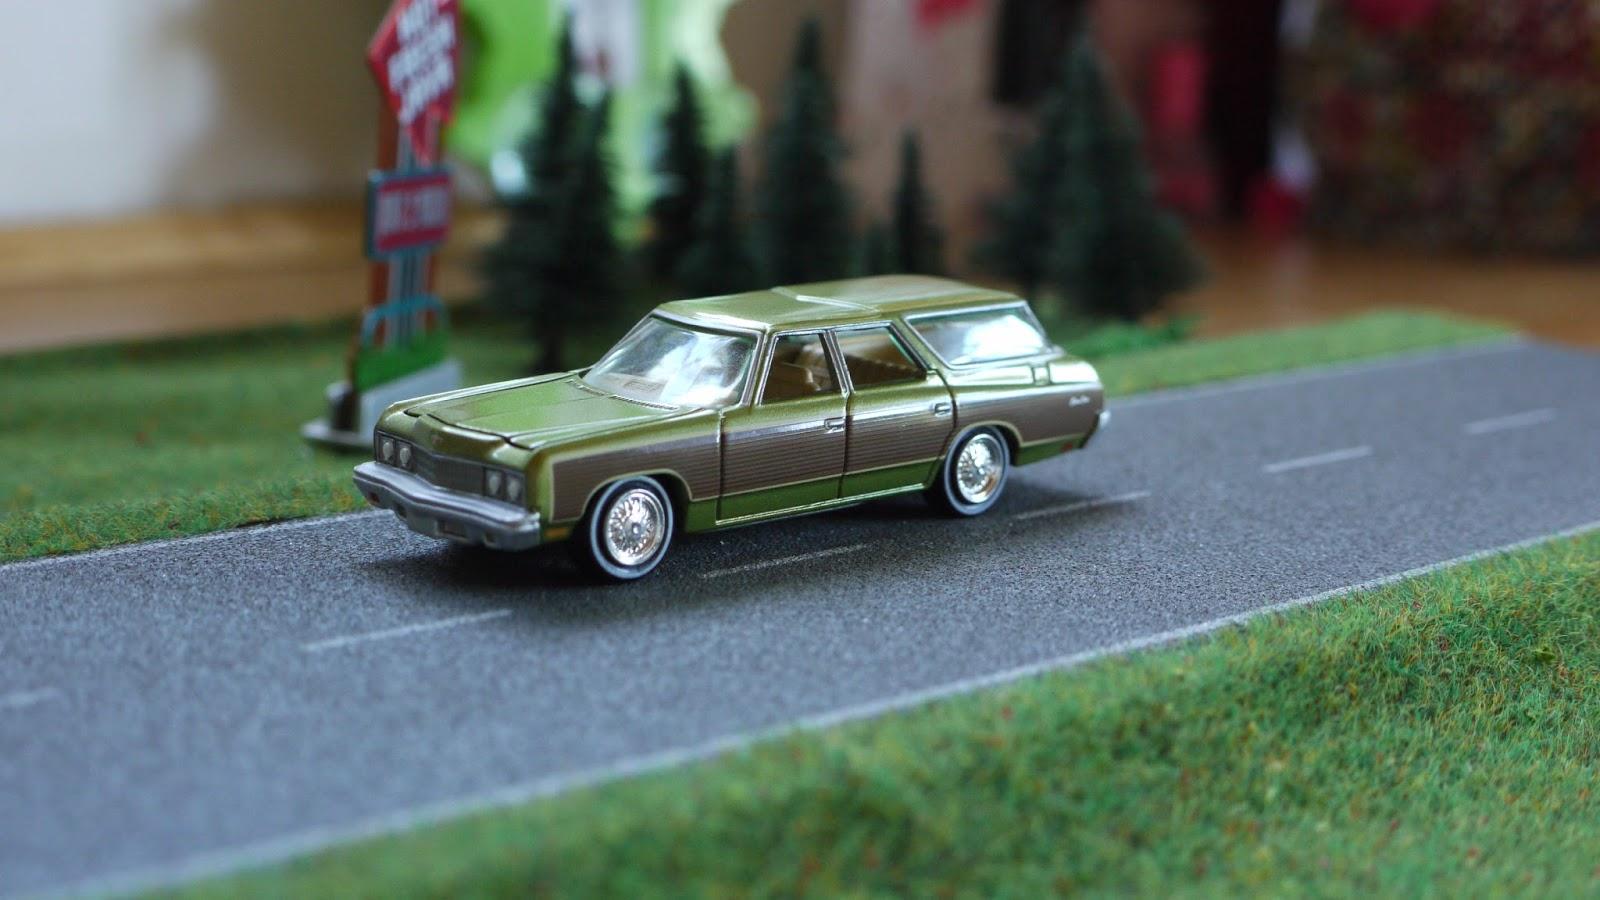 Diecast cars 1/64, Modellautos 1:64, Modellbilar 1:64: Chevrolet Caprice